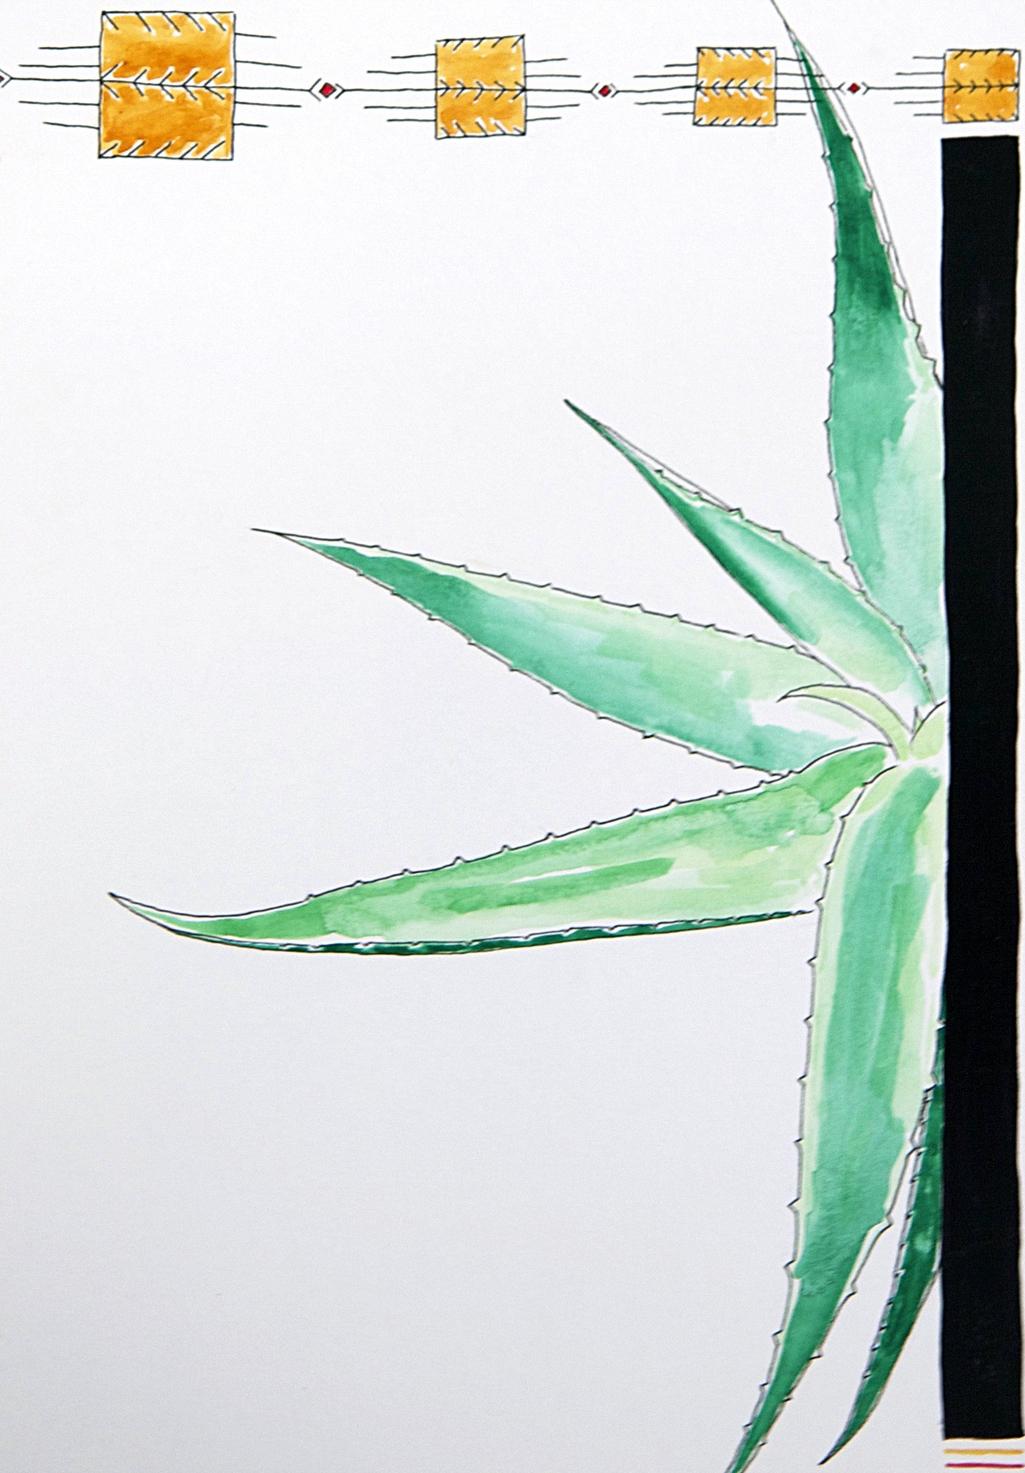 heal me a pattern \\ 11x15mixed media on paper  #mysortofgreenthumb   >> S H O P <<